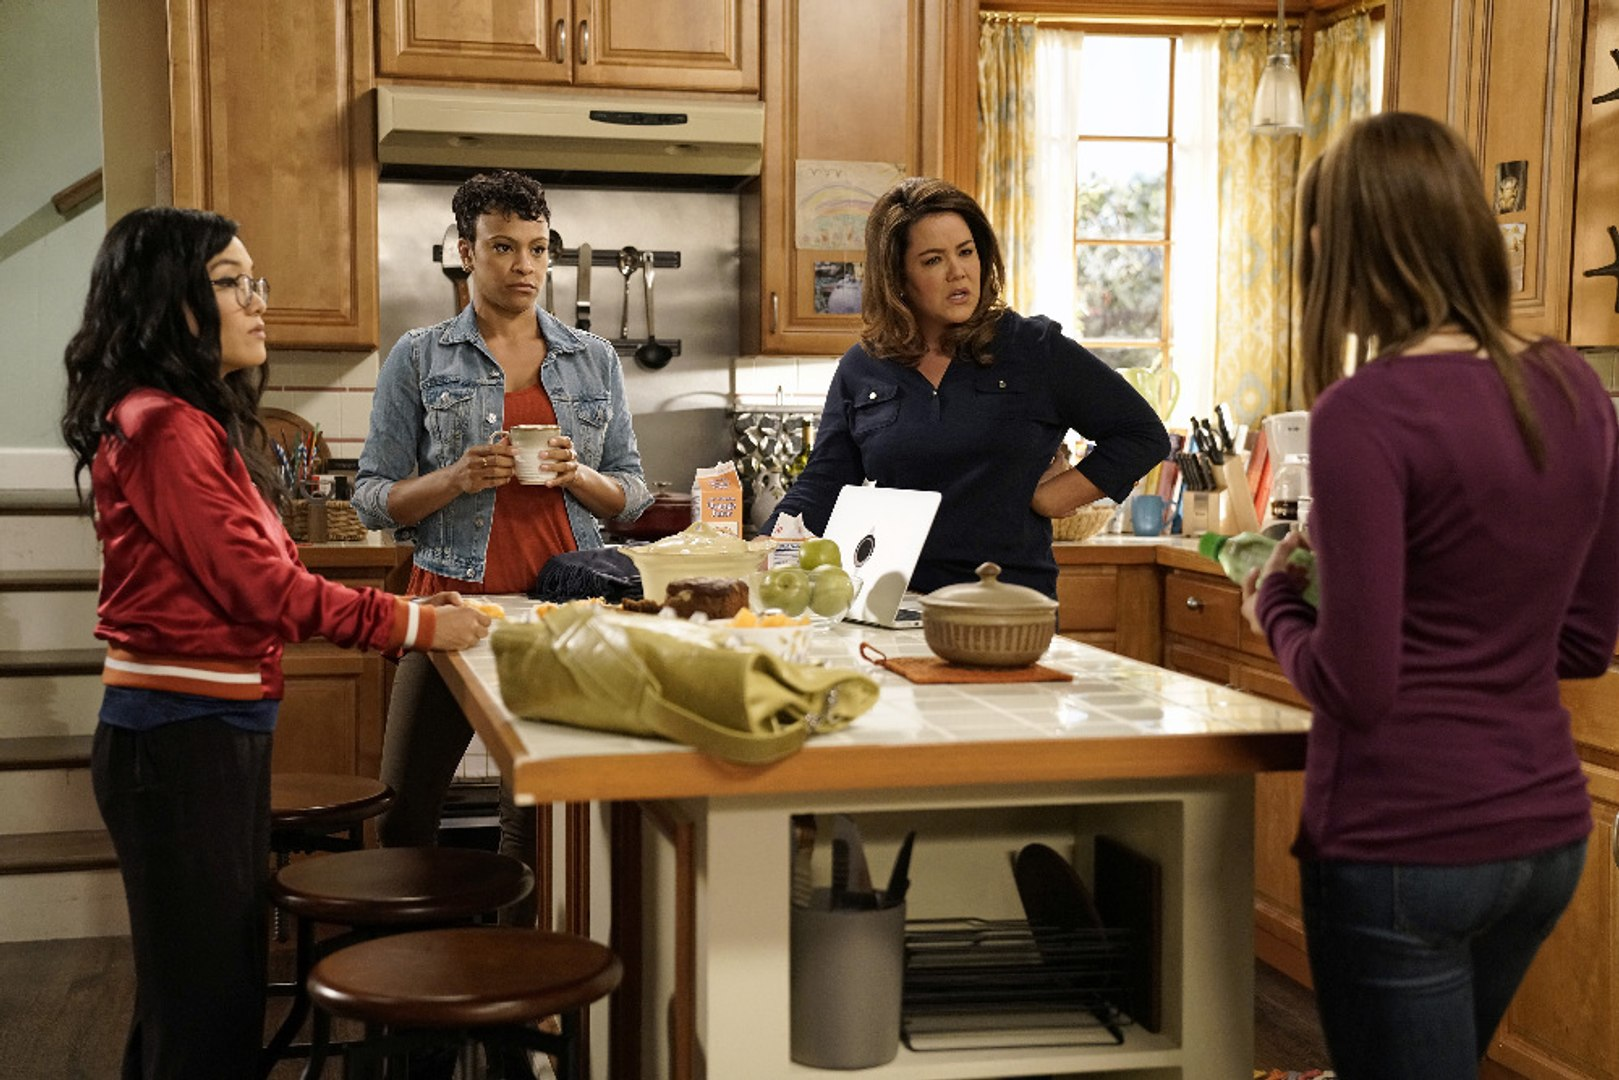 [Eps.04 - s2.e4] American Housewife 'Season 2 Episode 4' FuLL ~~  **FULL,SHOW**